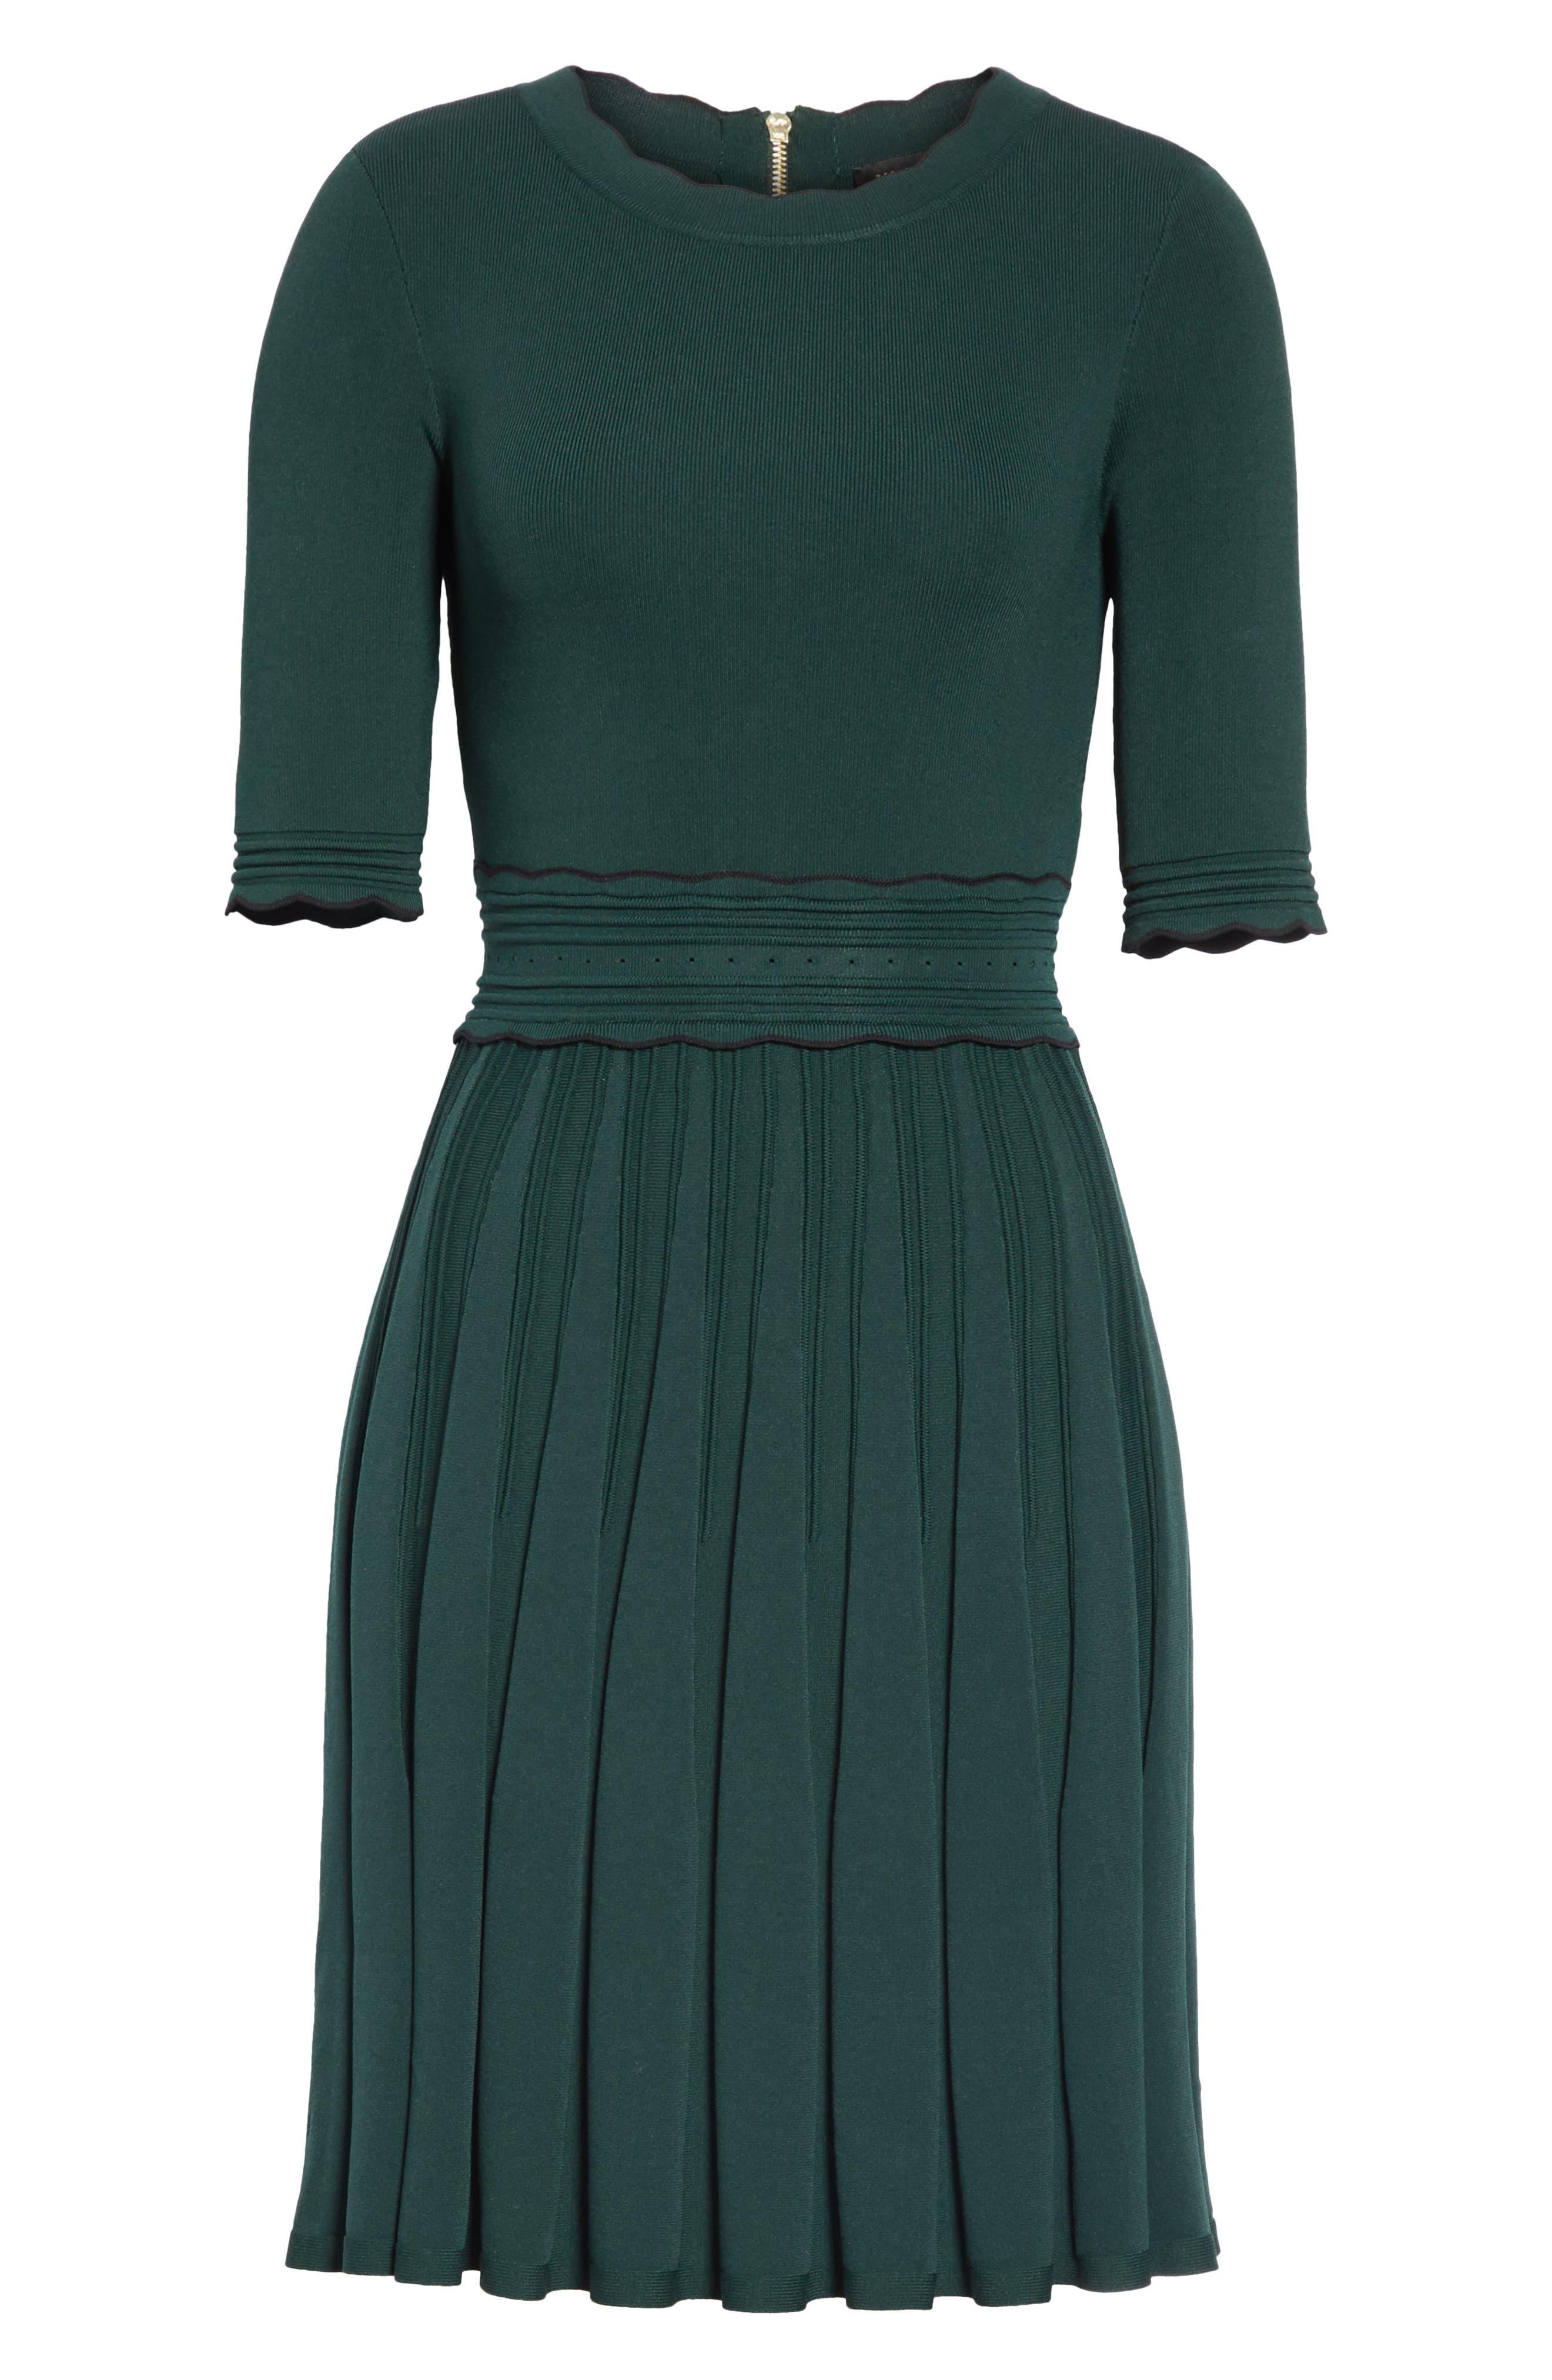 Dorlean Knit Dress,                             Alternate thumbnail 6, color,                             DARK GREEN